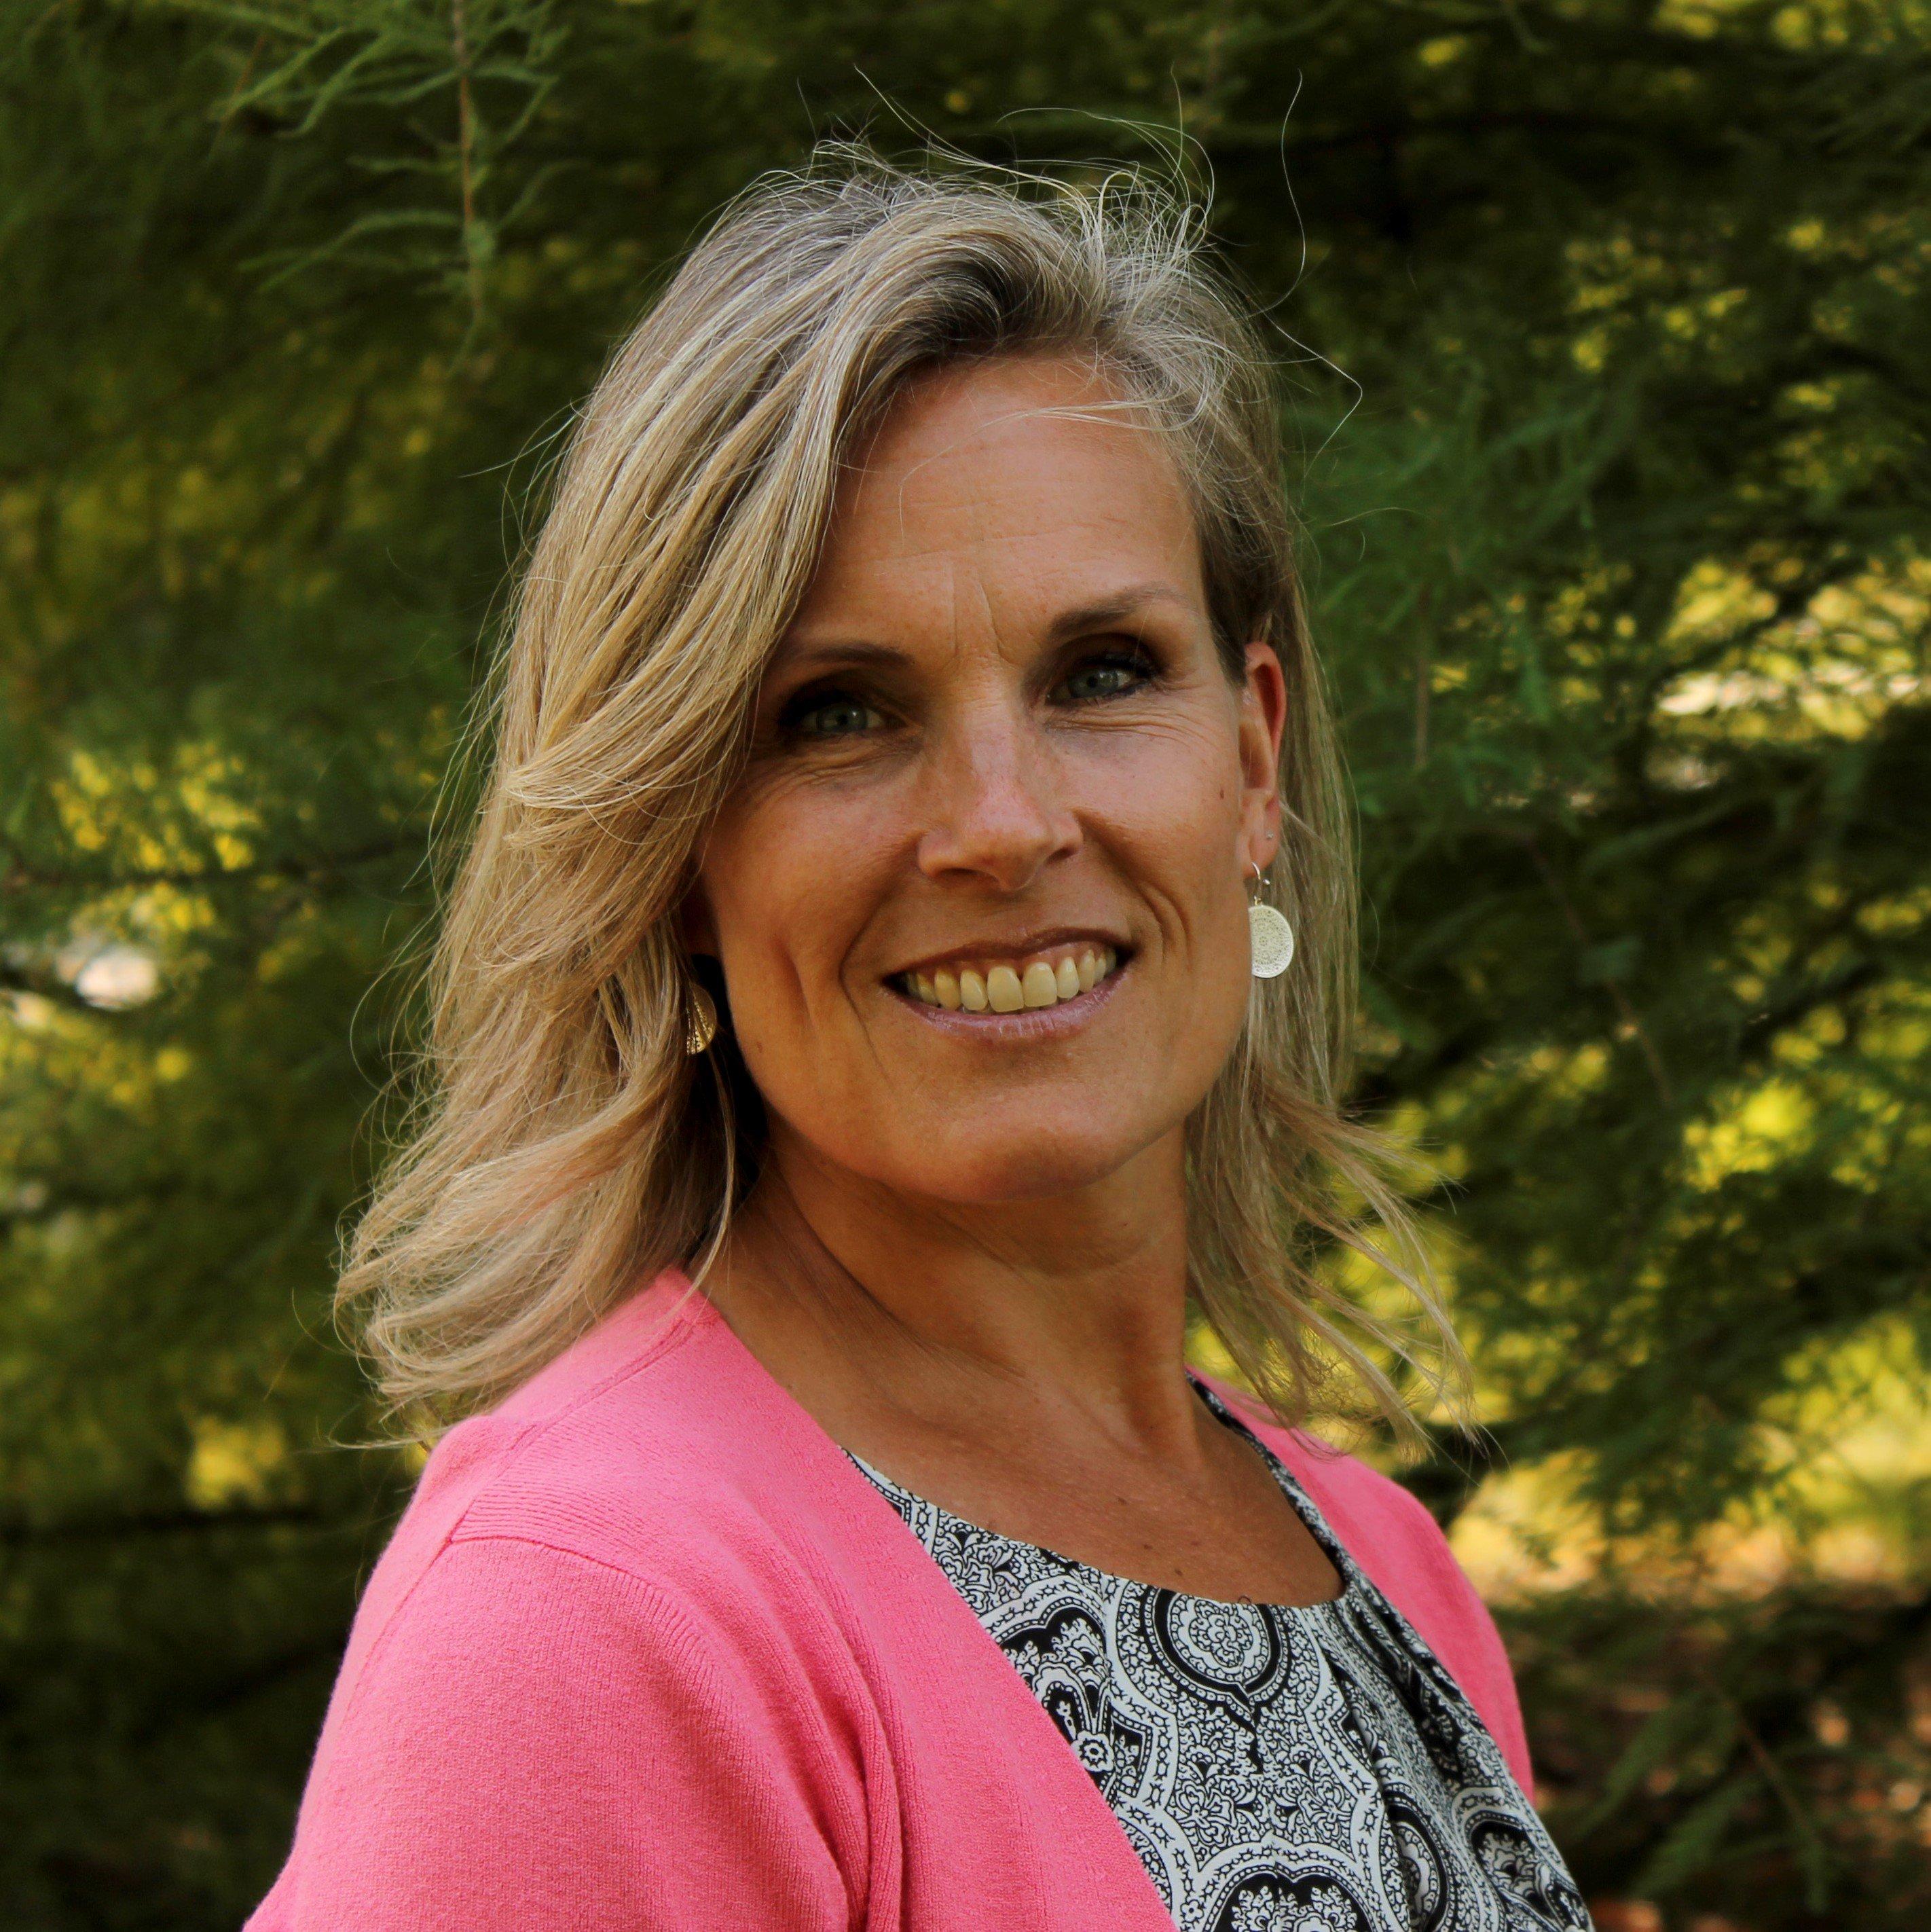 Amy MacAdam, teacher's aide at Clapham School in Wheaton, IL